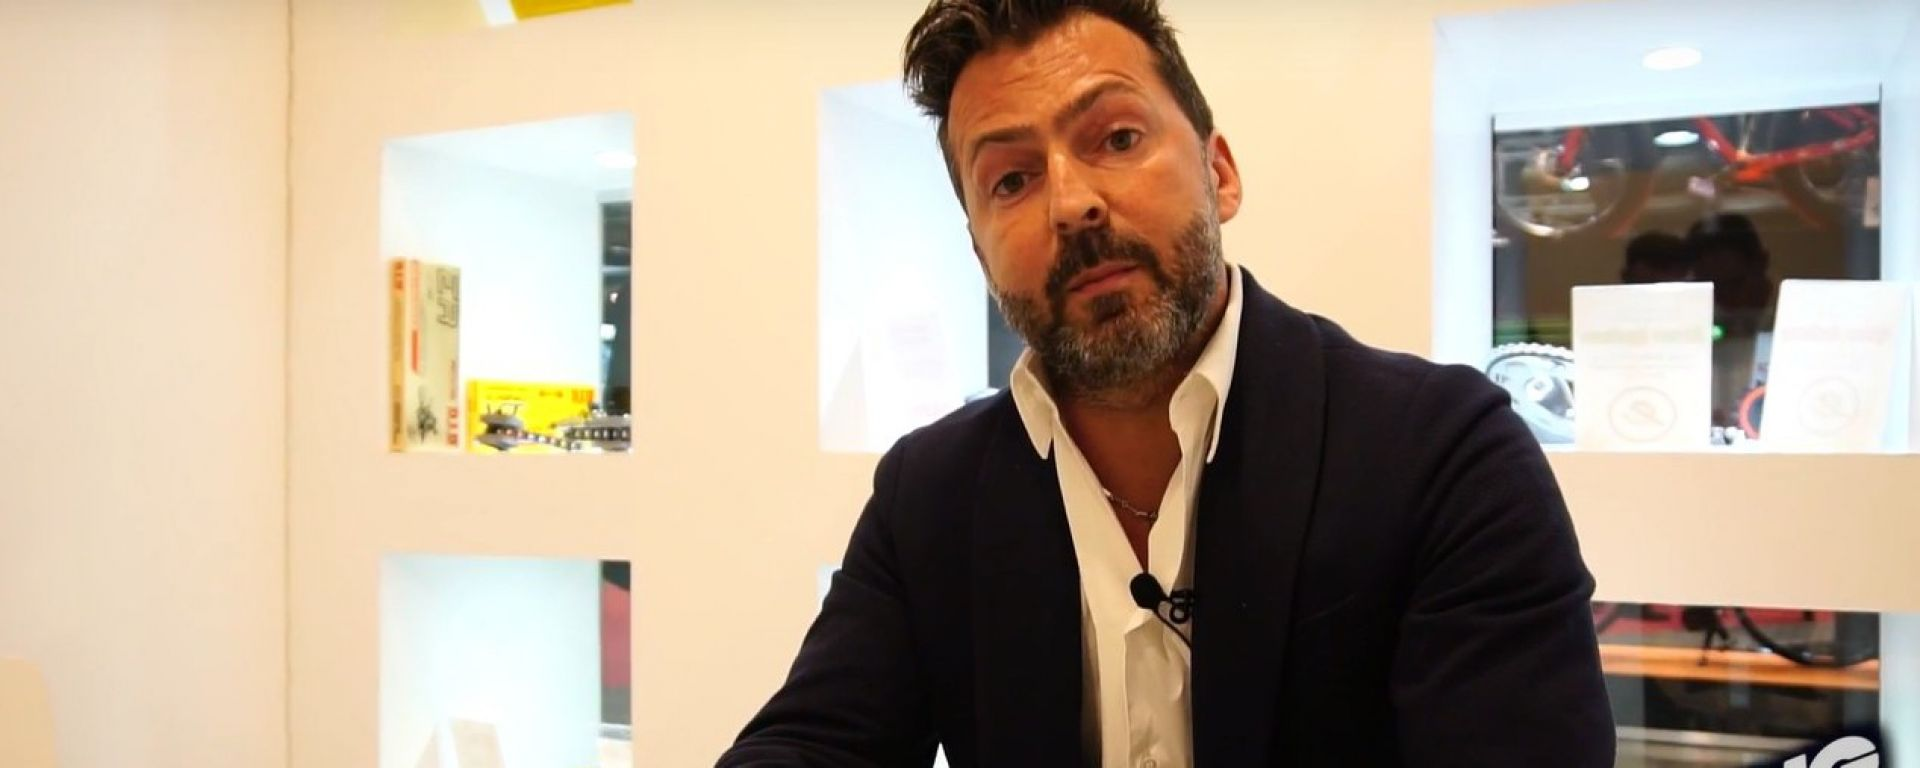 Federico Arbizzani, Sales Manager Motorcycles Dept. Ogni Bene